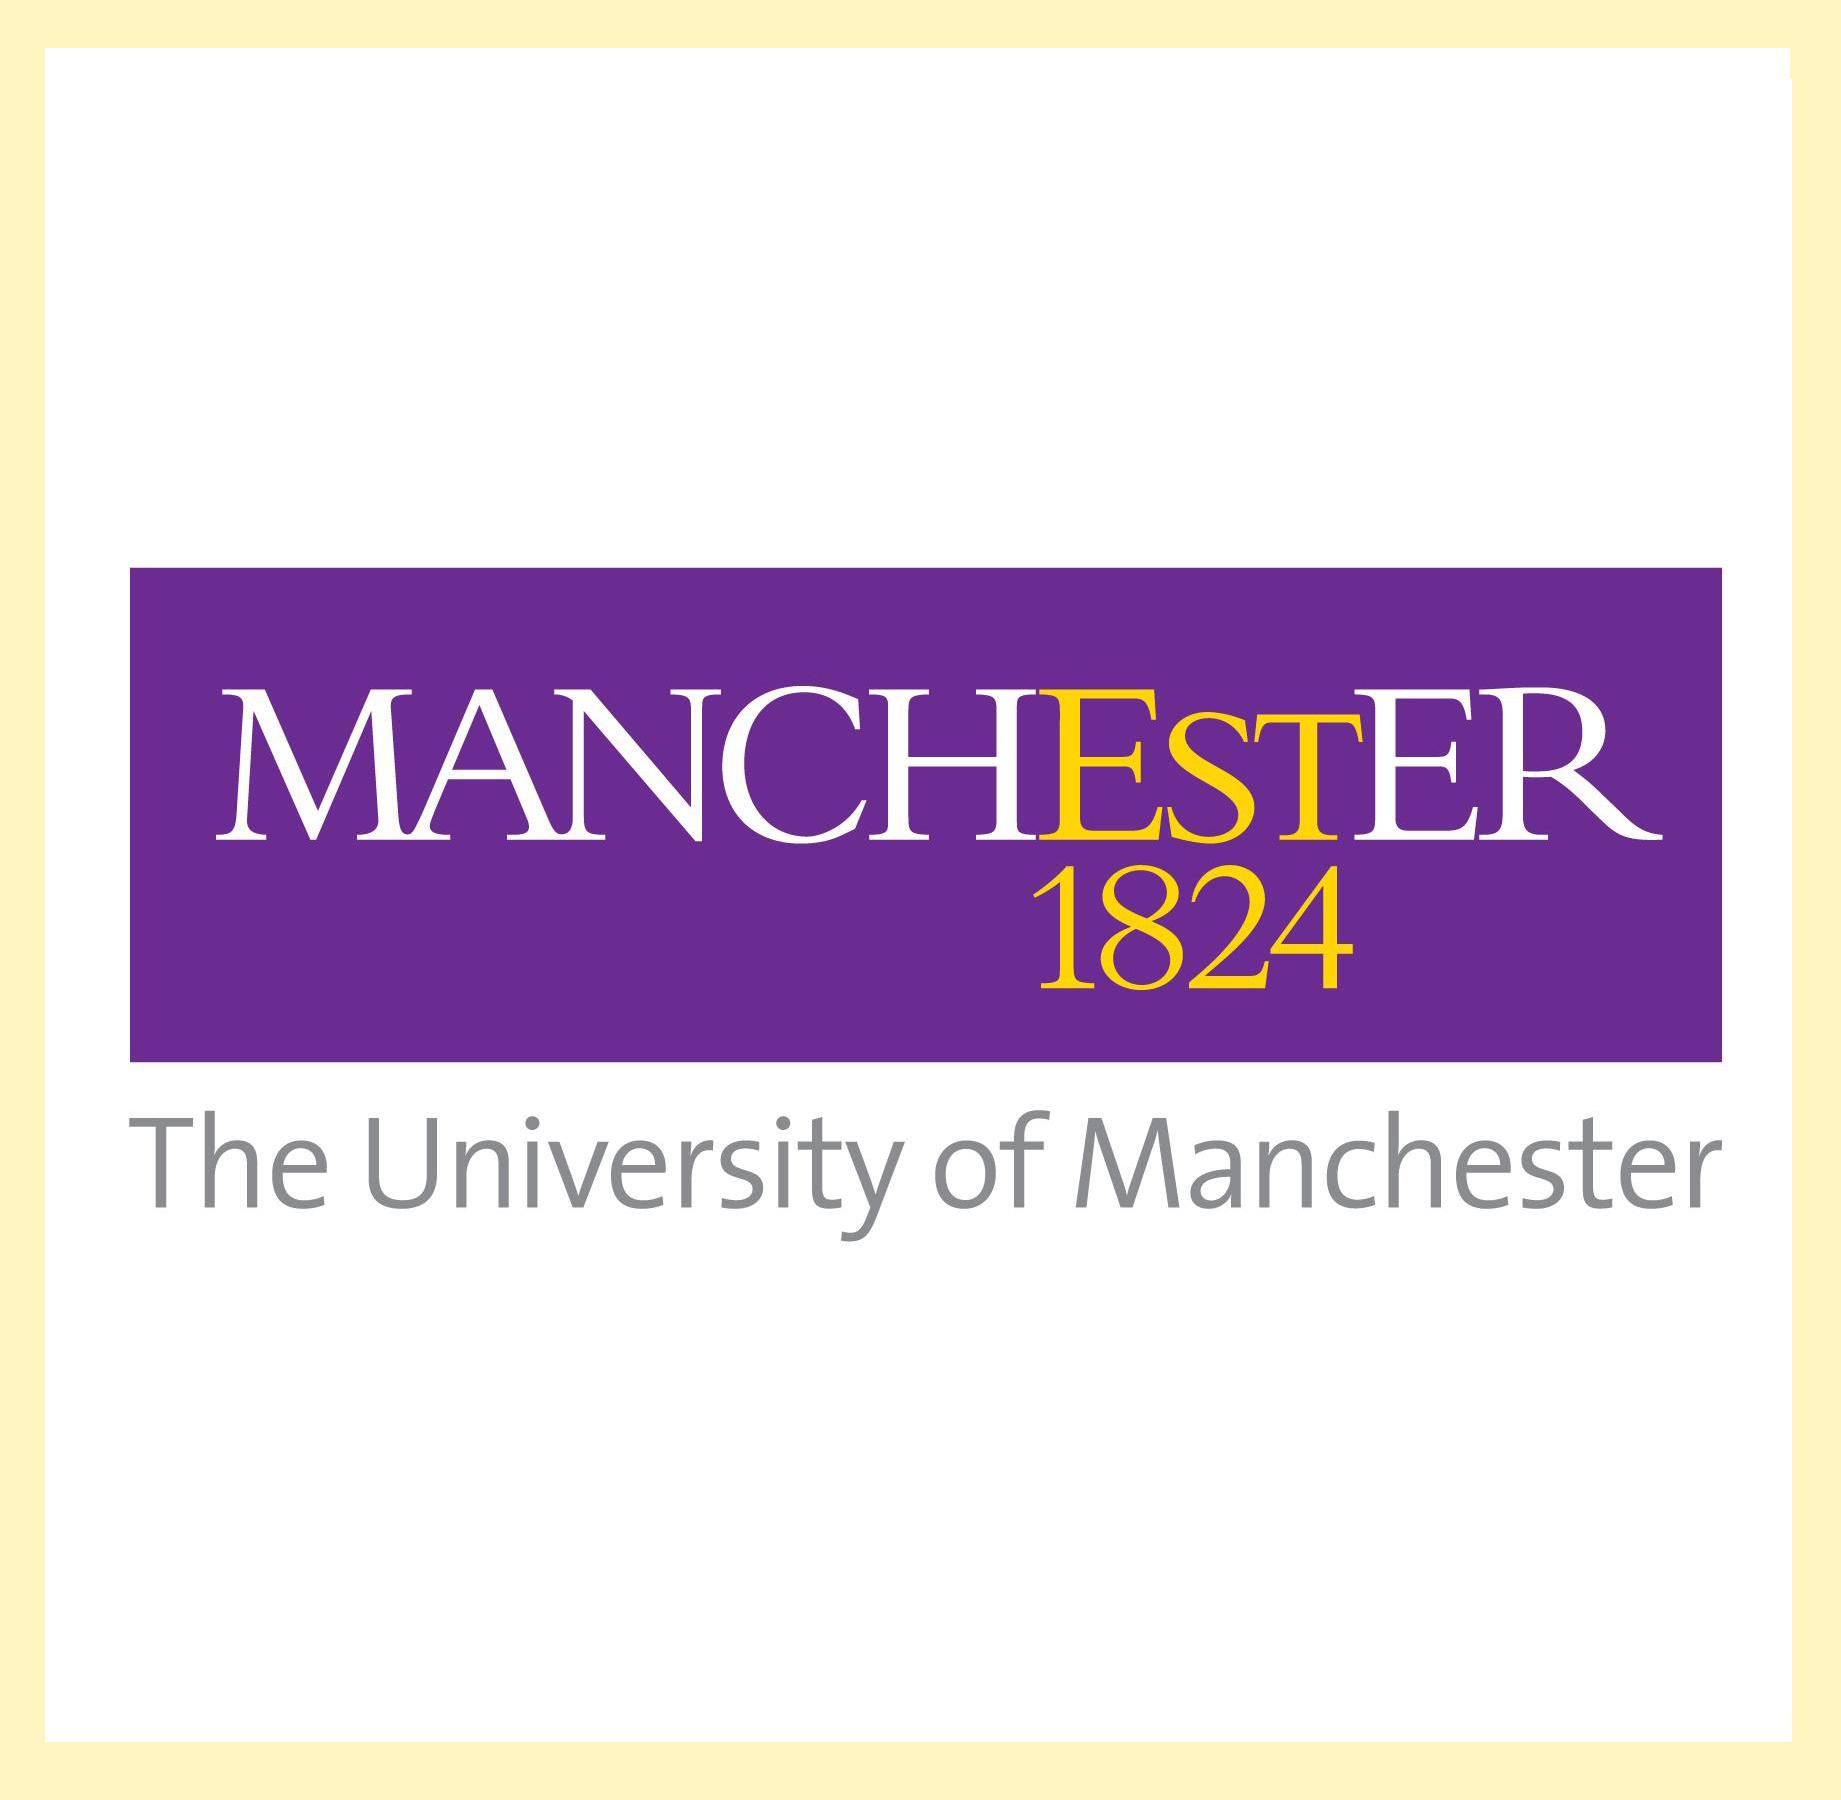 University of Manchester Win | Penoyre & Prasad Architects, London